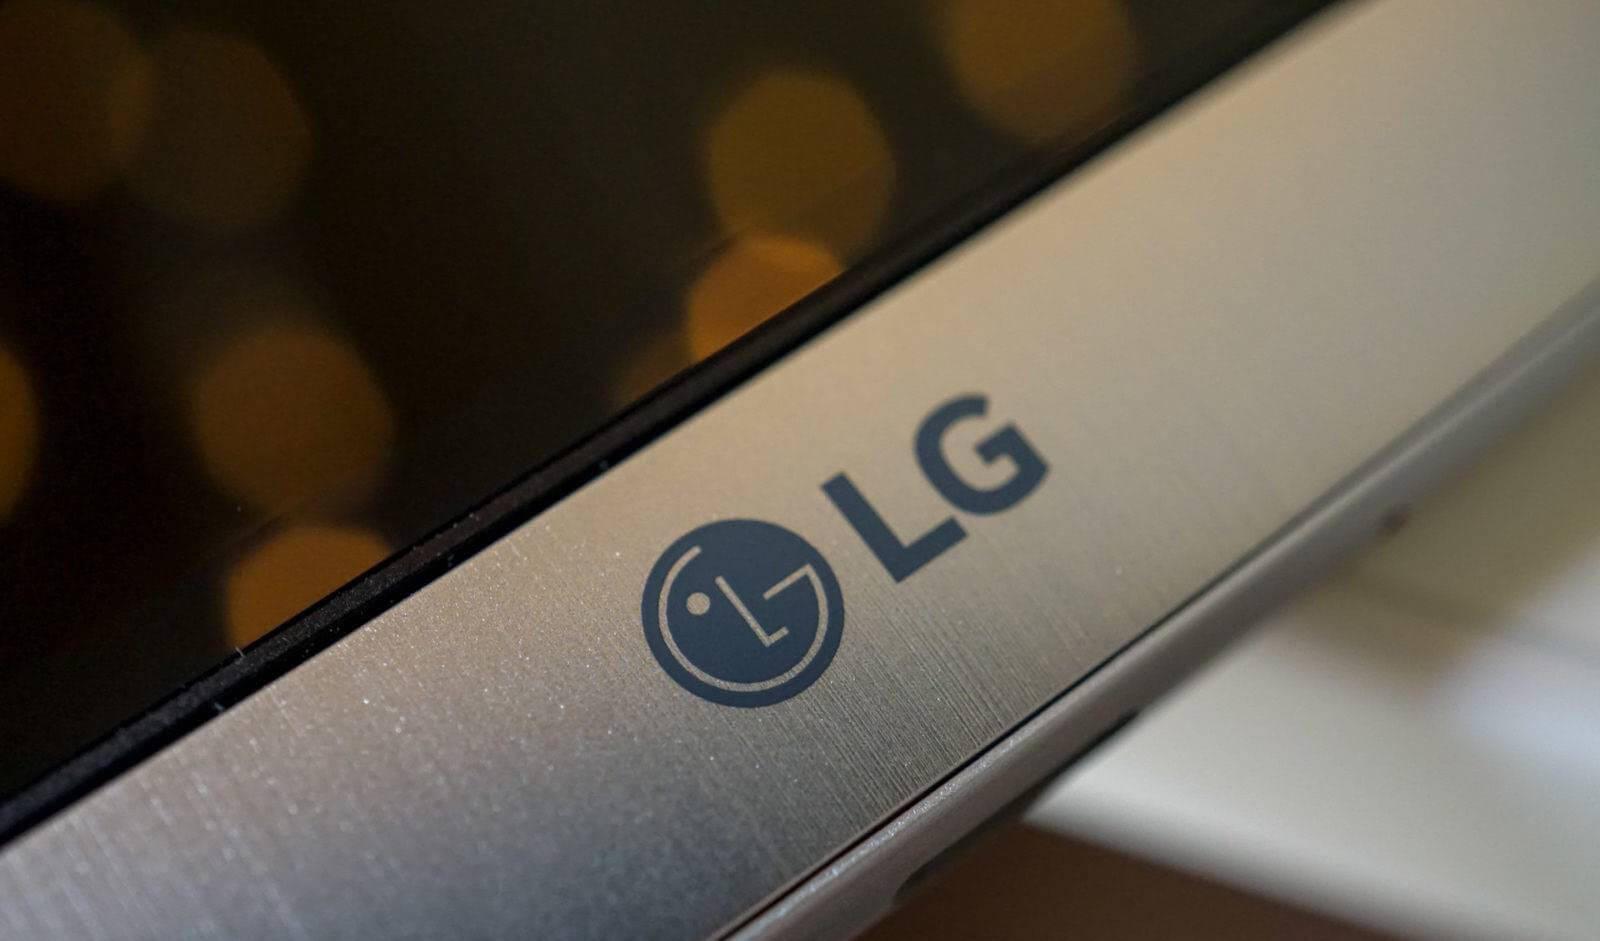 Lg g5 logo am ah 1 1600x1067 2